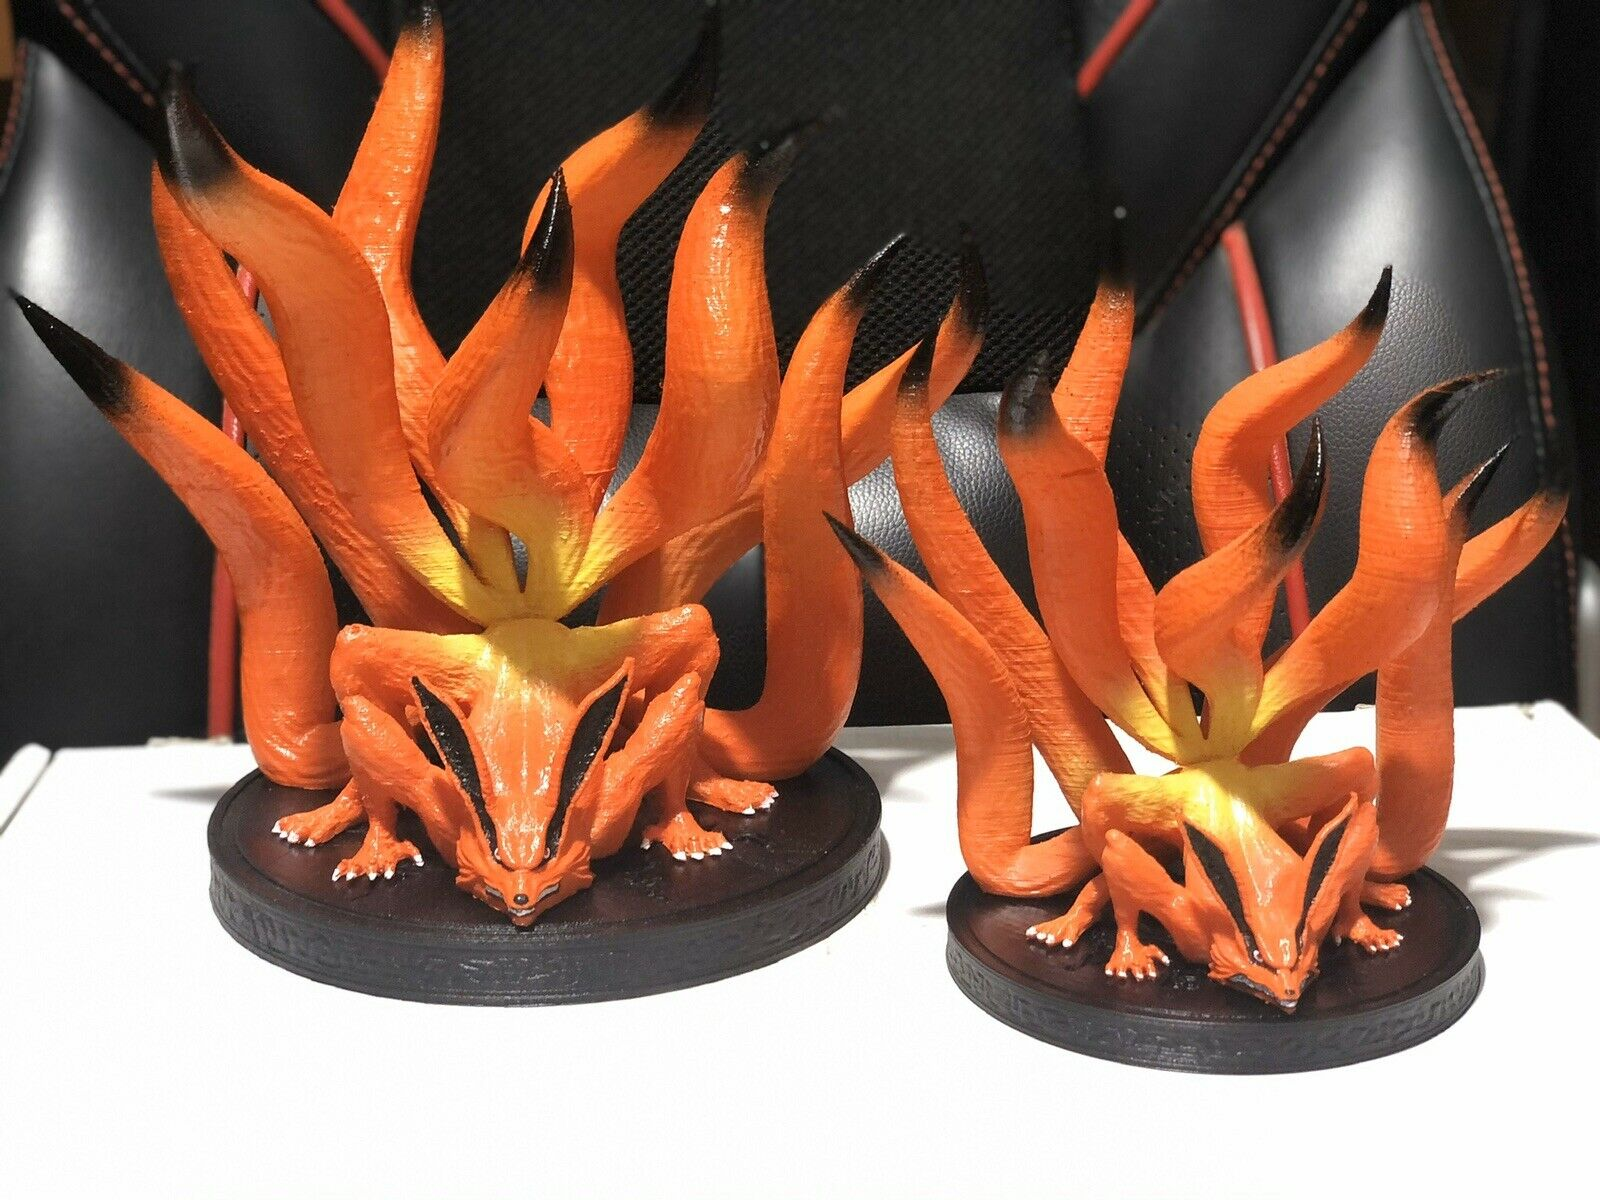 Kurama Volpe A Nove Code Naruto 25cm